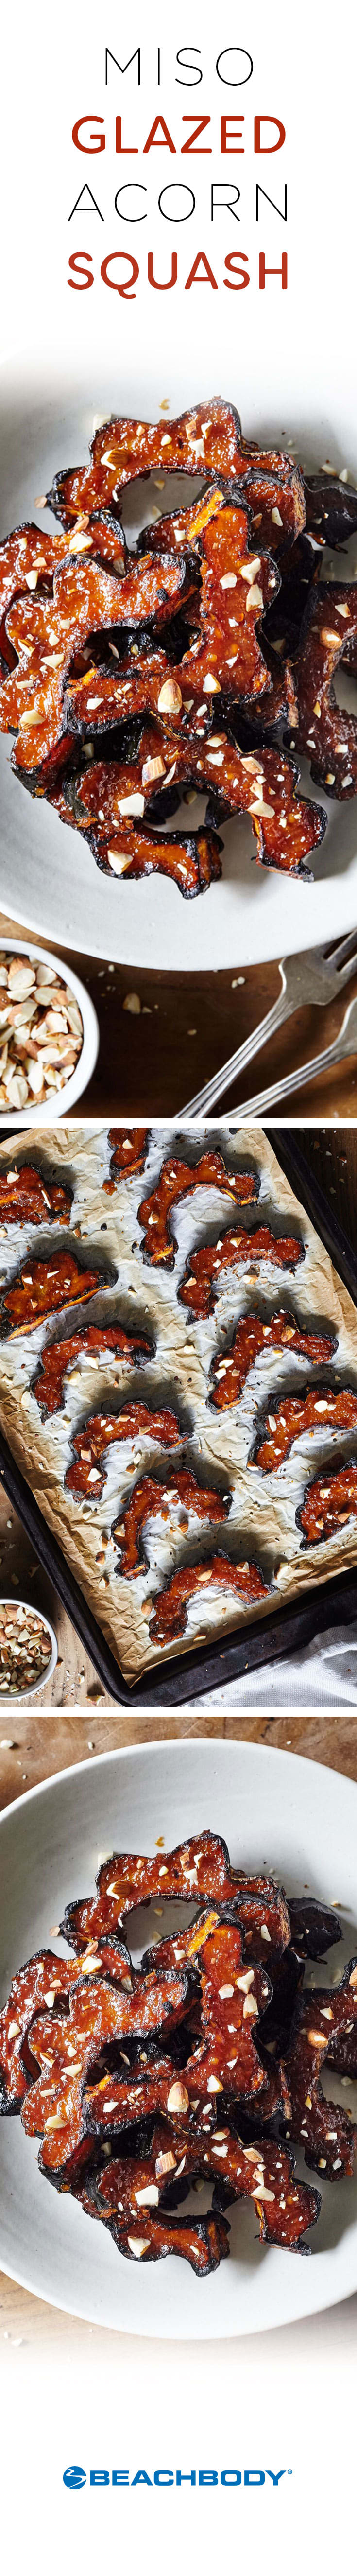 Miso-Glazed Acorn Squash